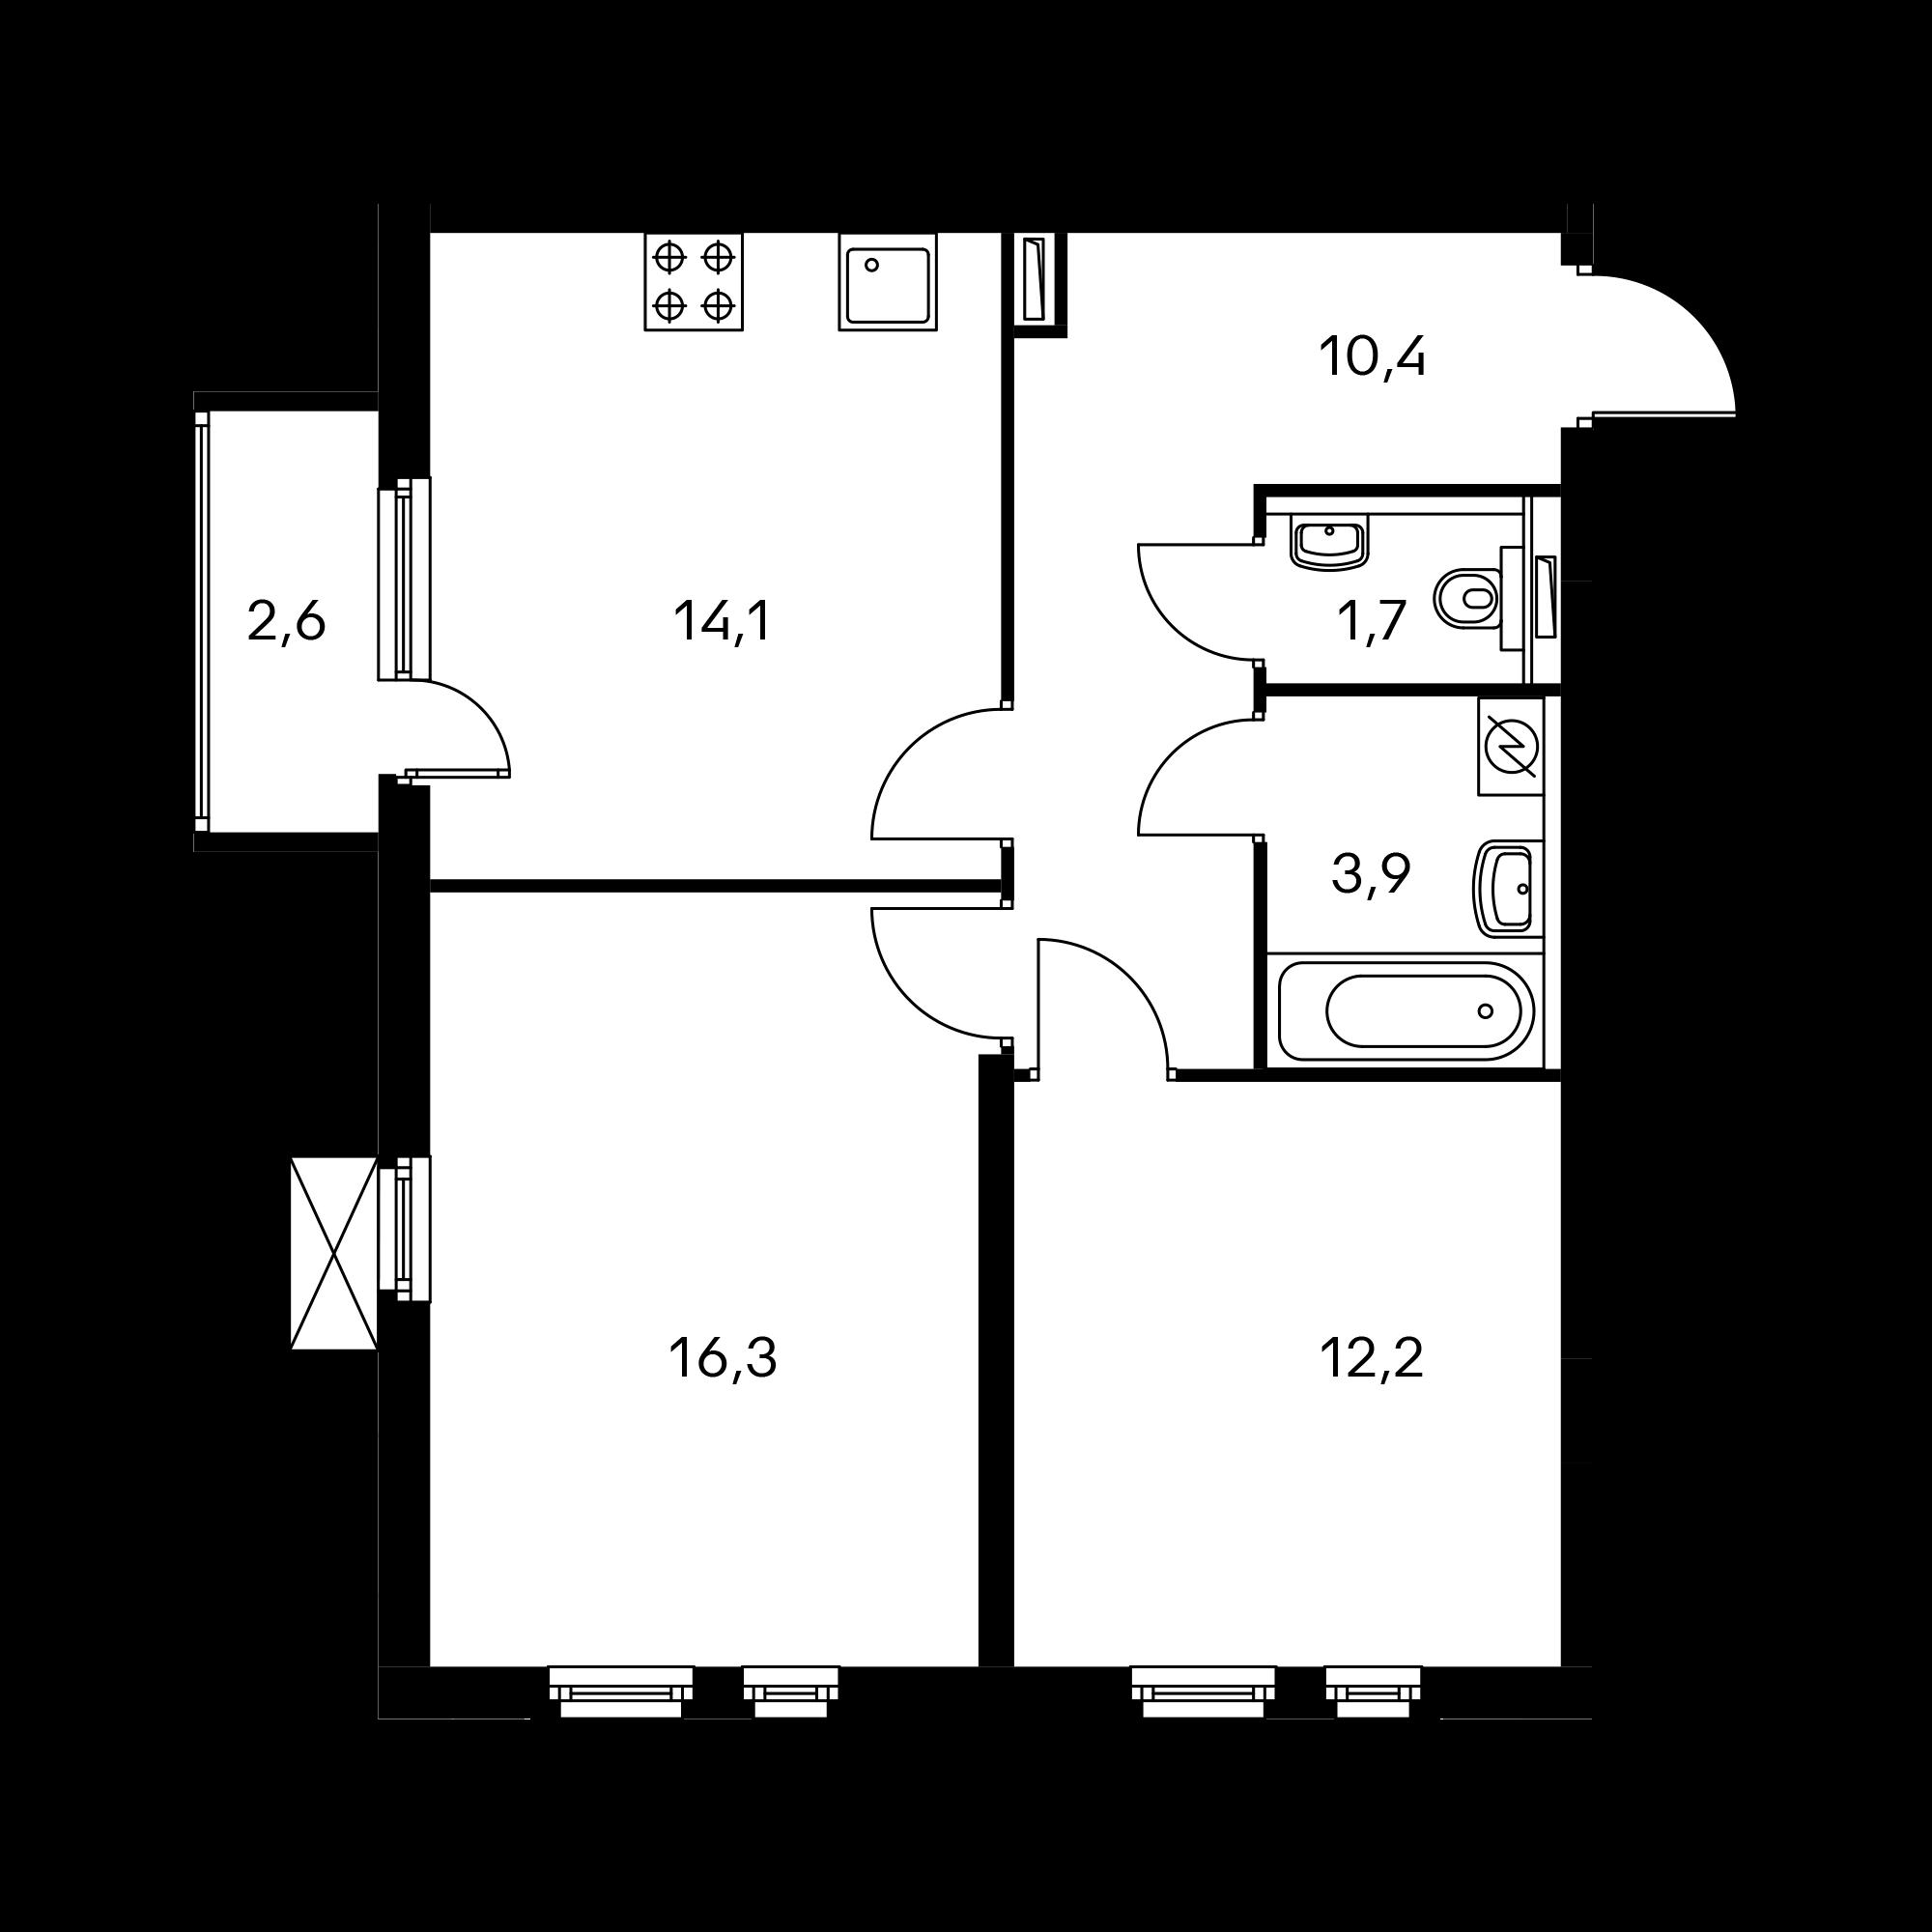 2KM1B_9.6-1SZ1